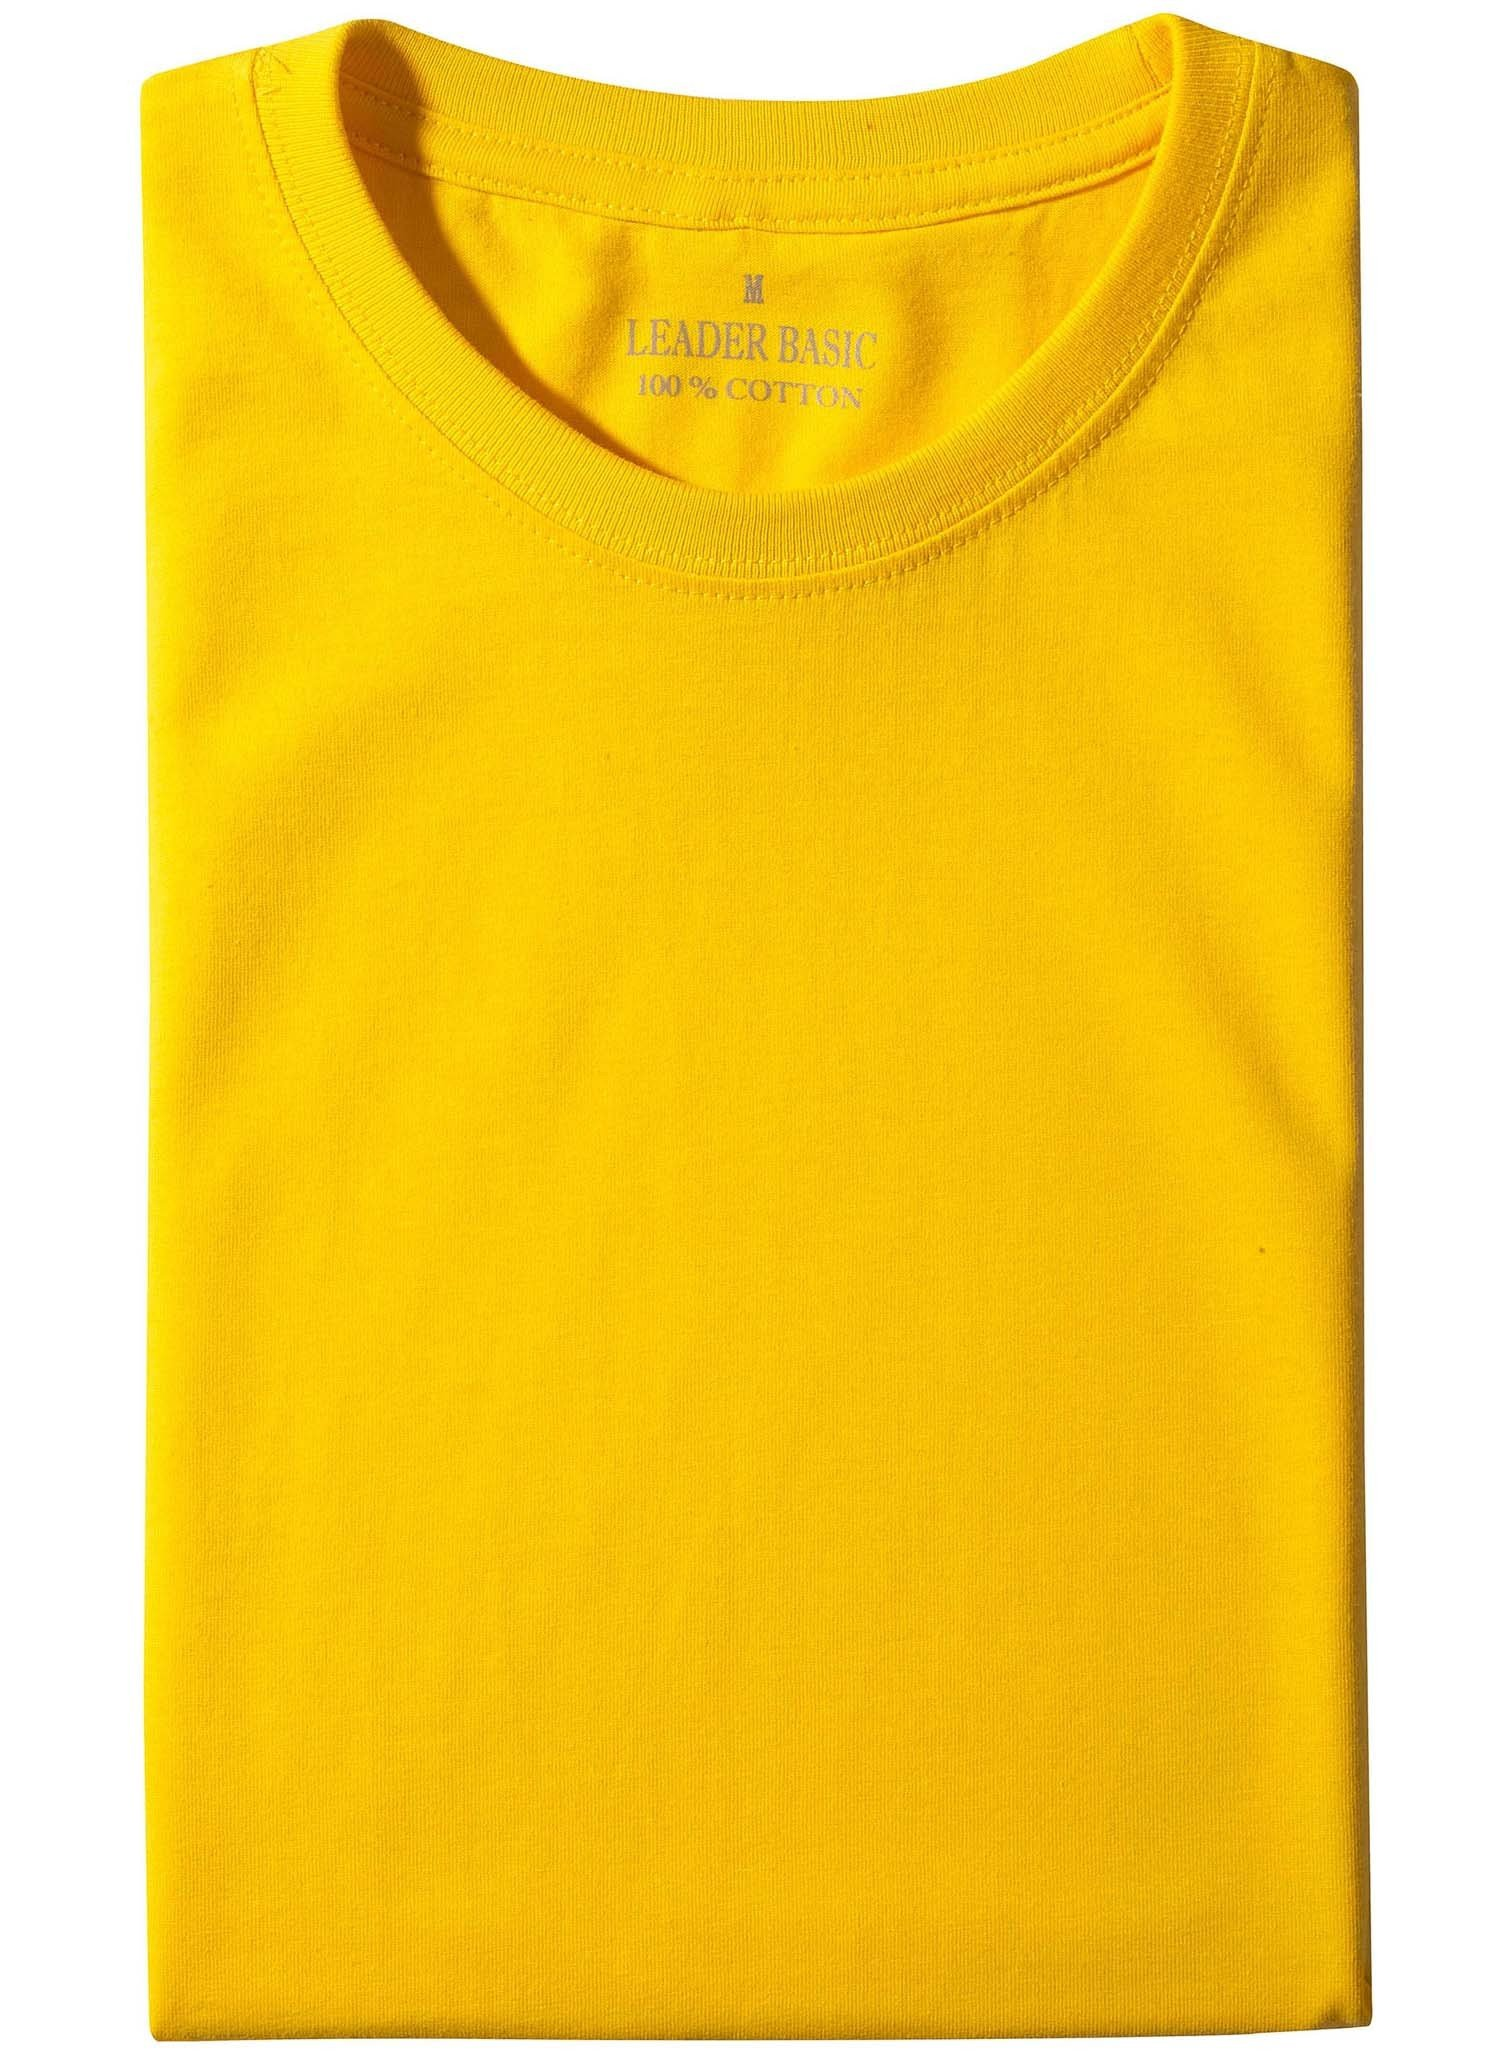 U-Duo-Pack-Shirt gelb XXXL 015 - 1 - Ronja.ch